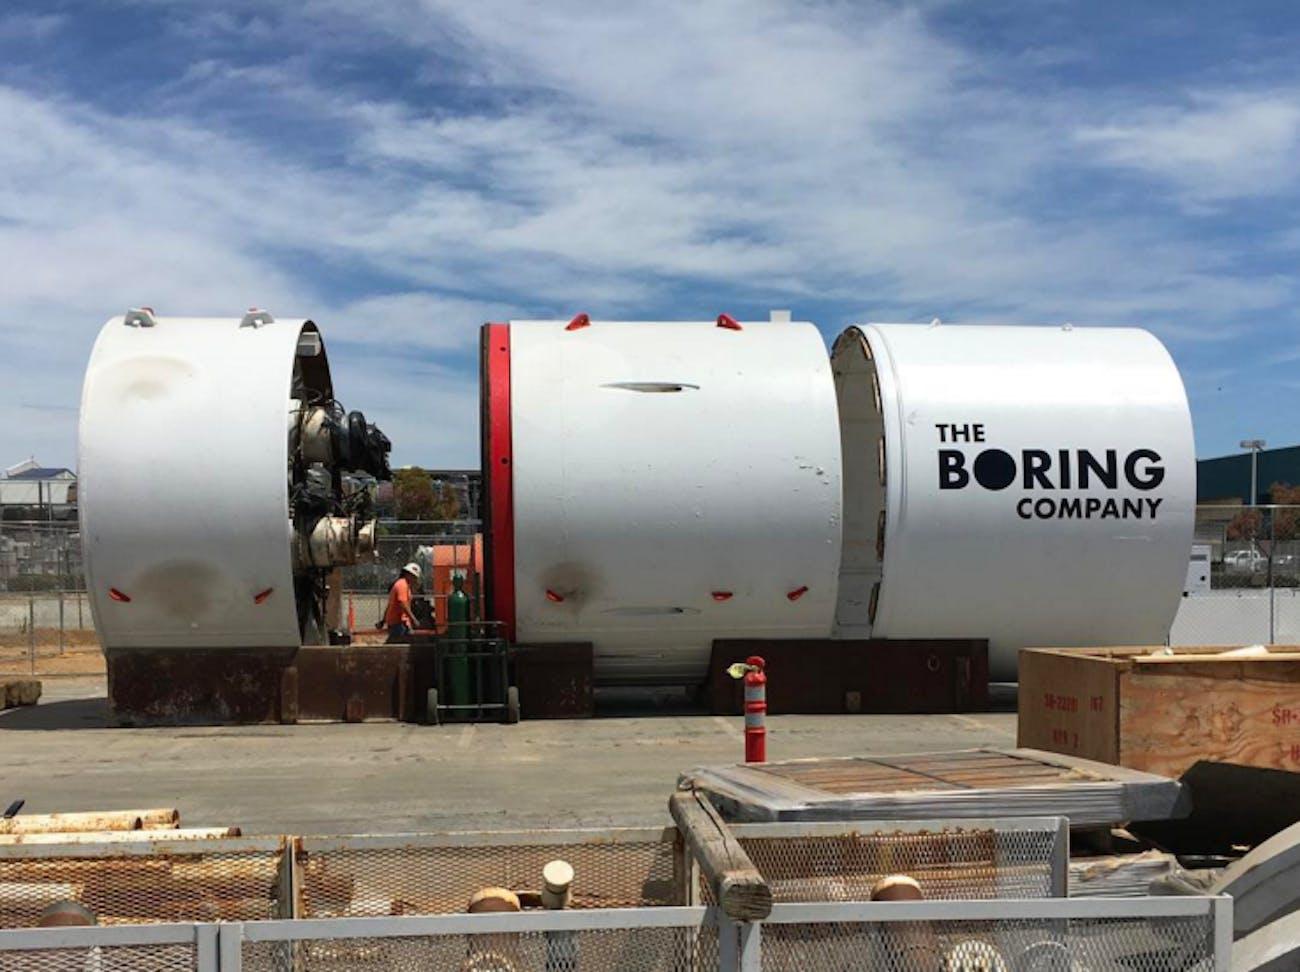 The Boring Company's boring machine, Musk has named Godot.